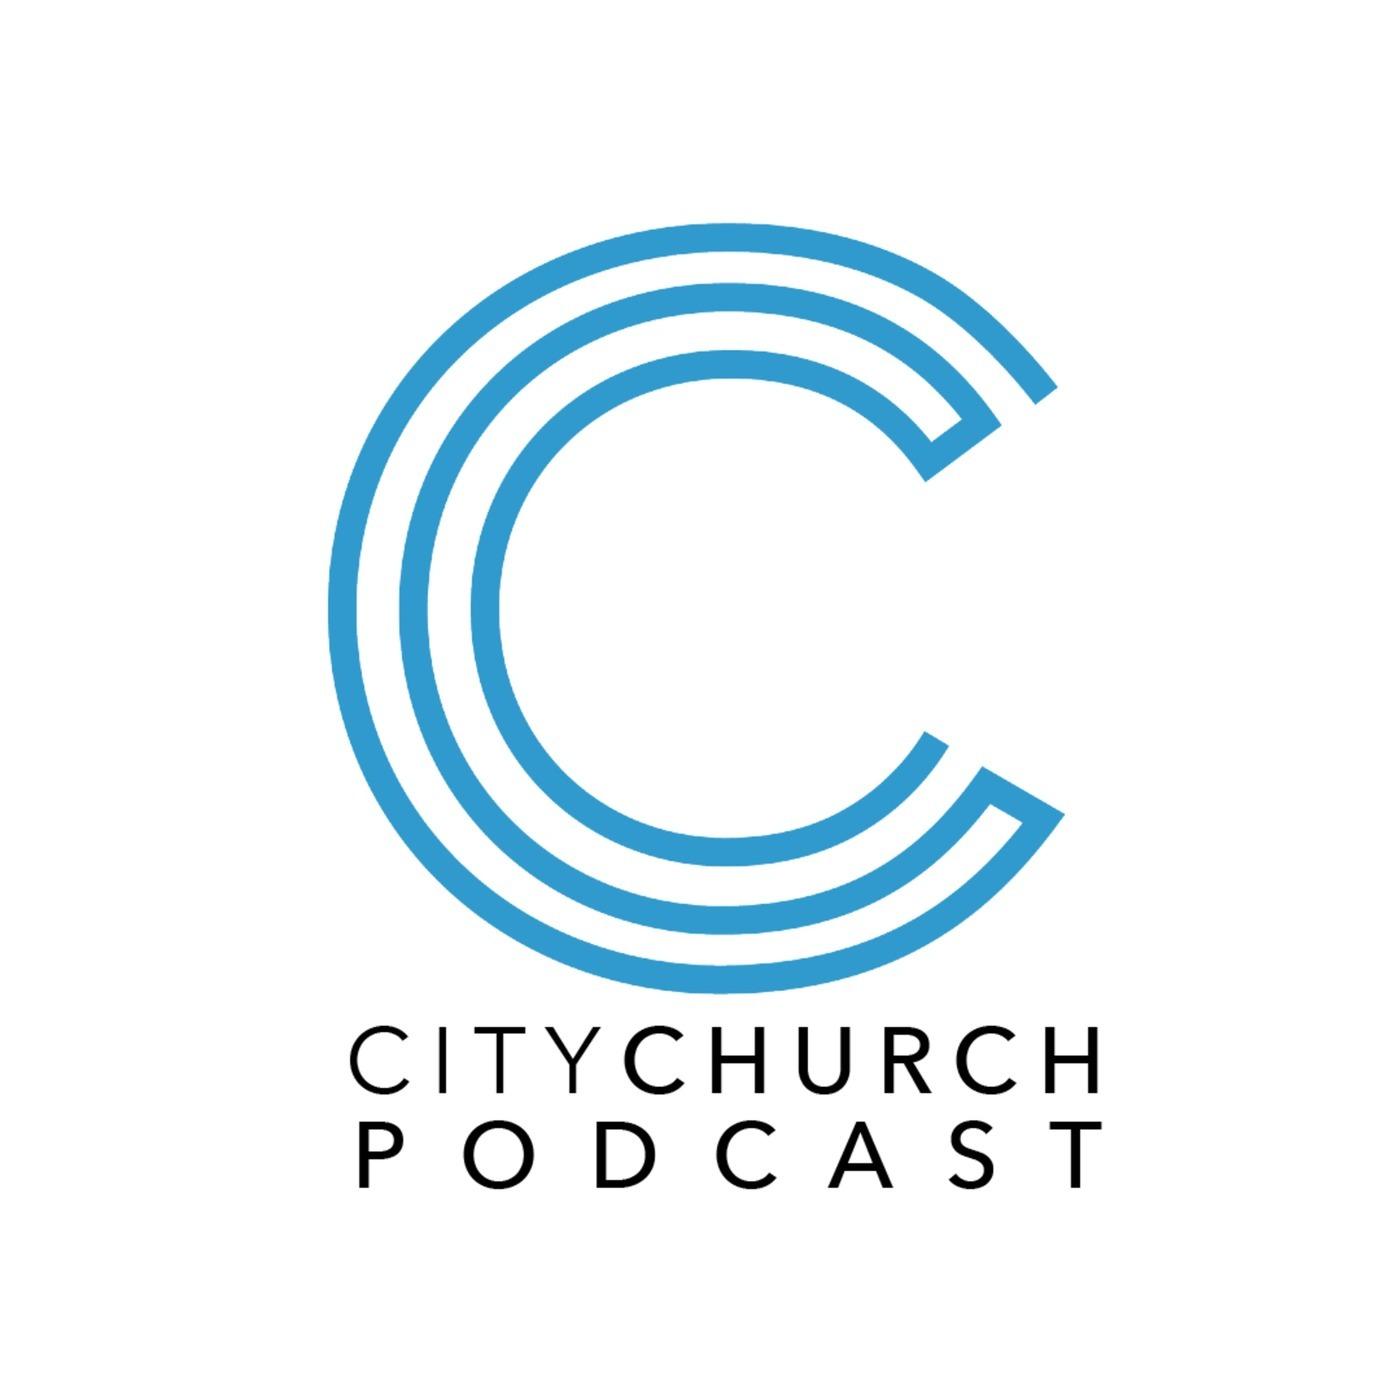 City Church 107: Wild Blue Yonder: Part 3